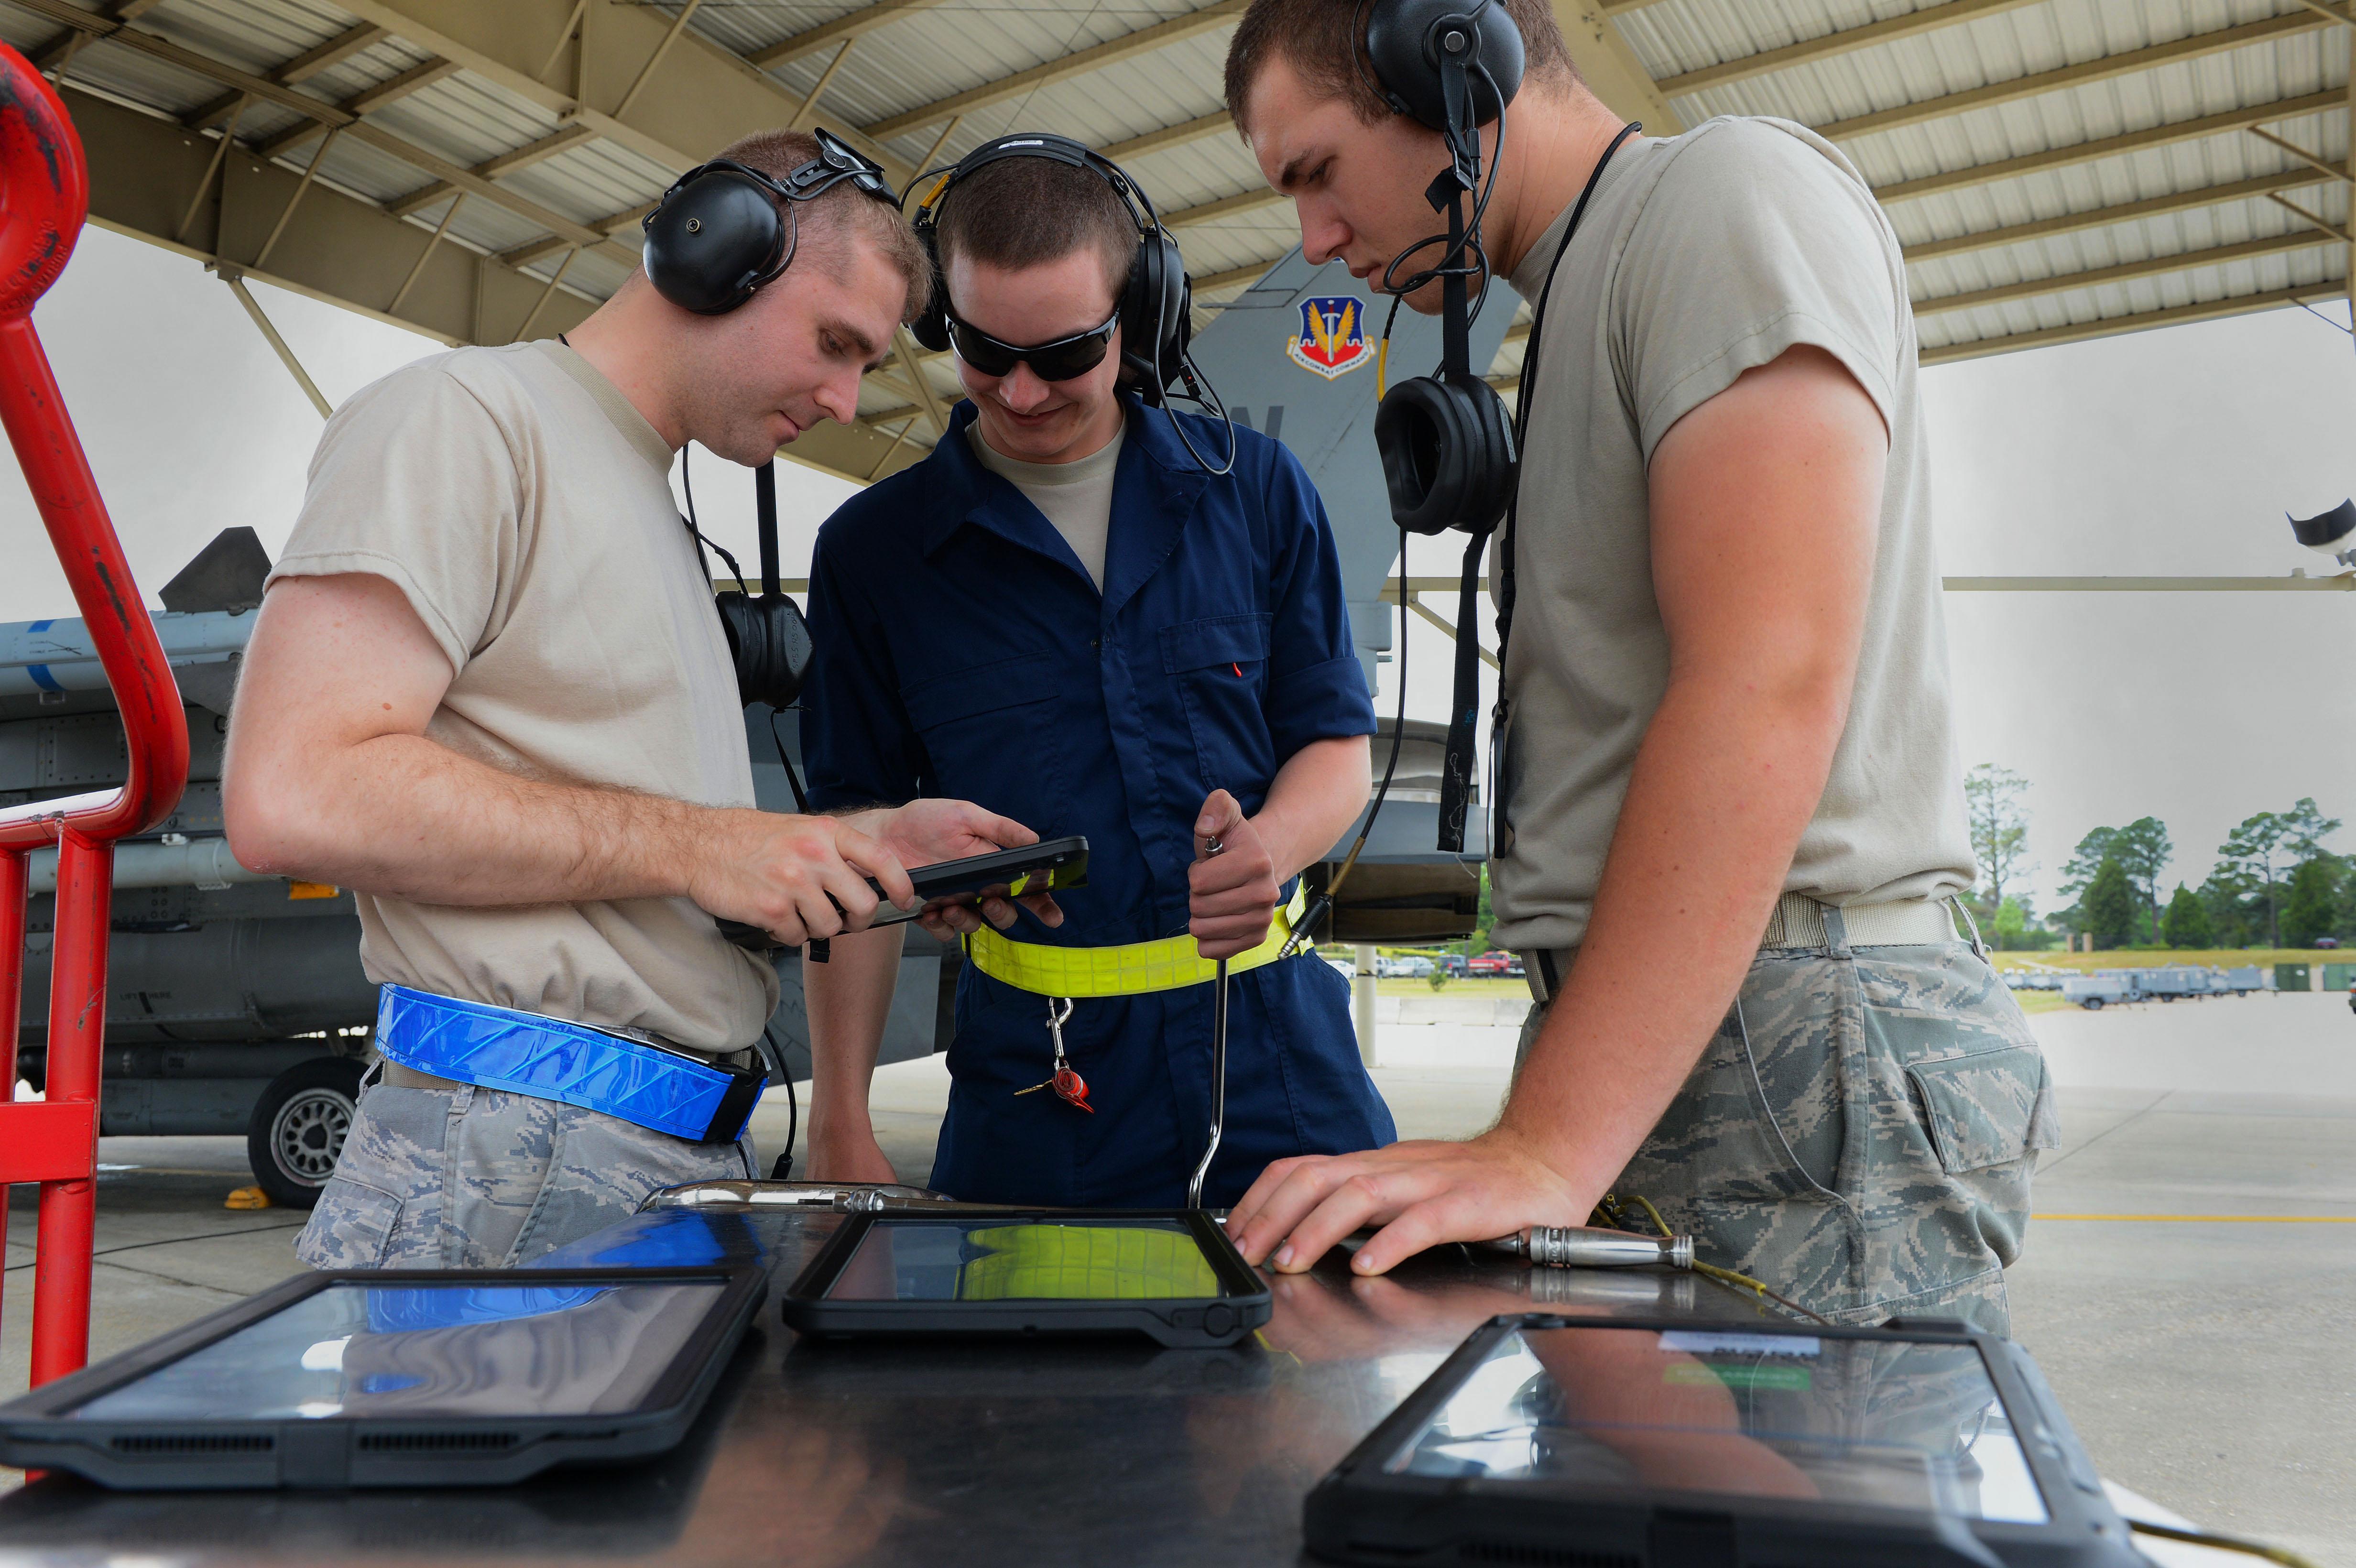 tablet technology to aid maintenance airmen u003e u s air force rh af mil air force technical manual 00-33a-1109 air force technical manuals online